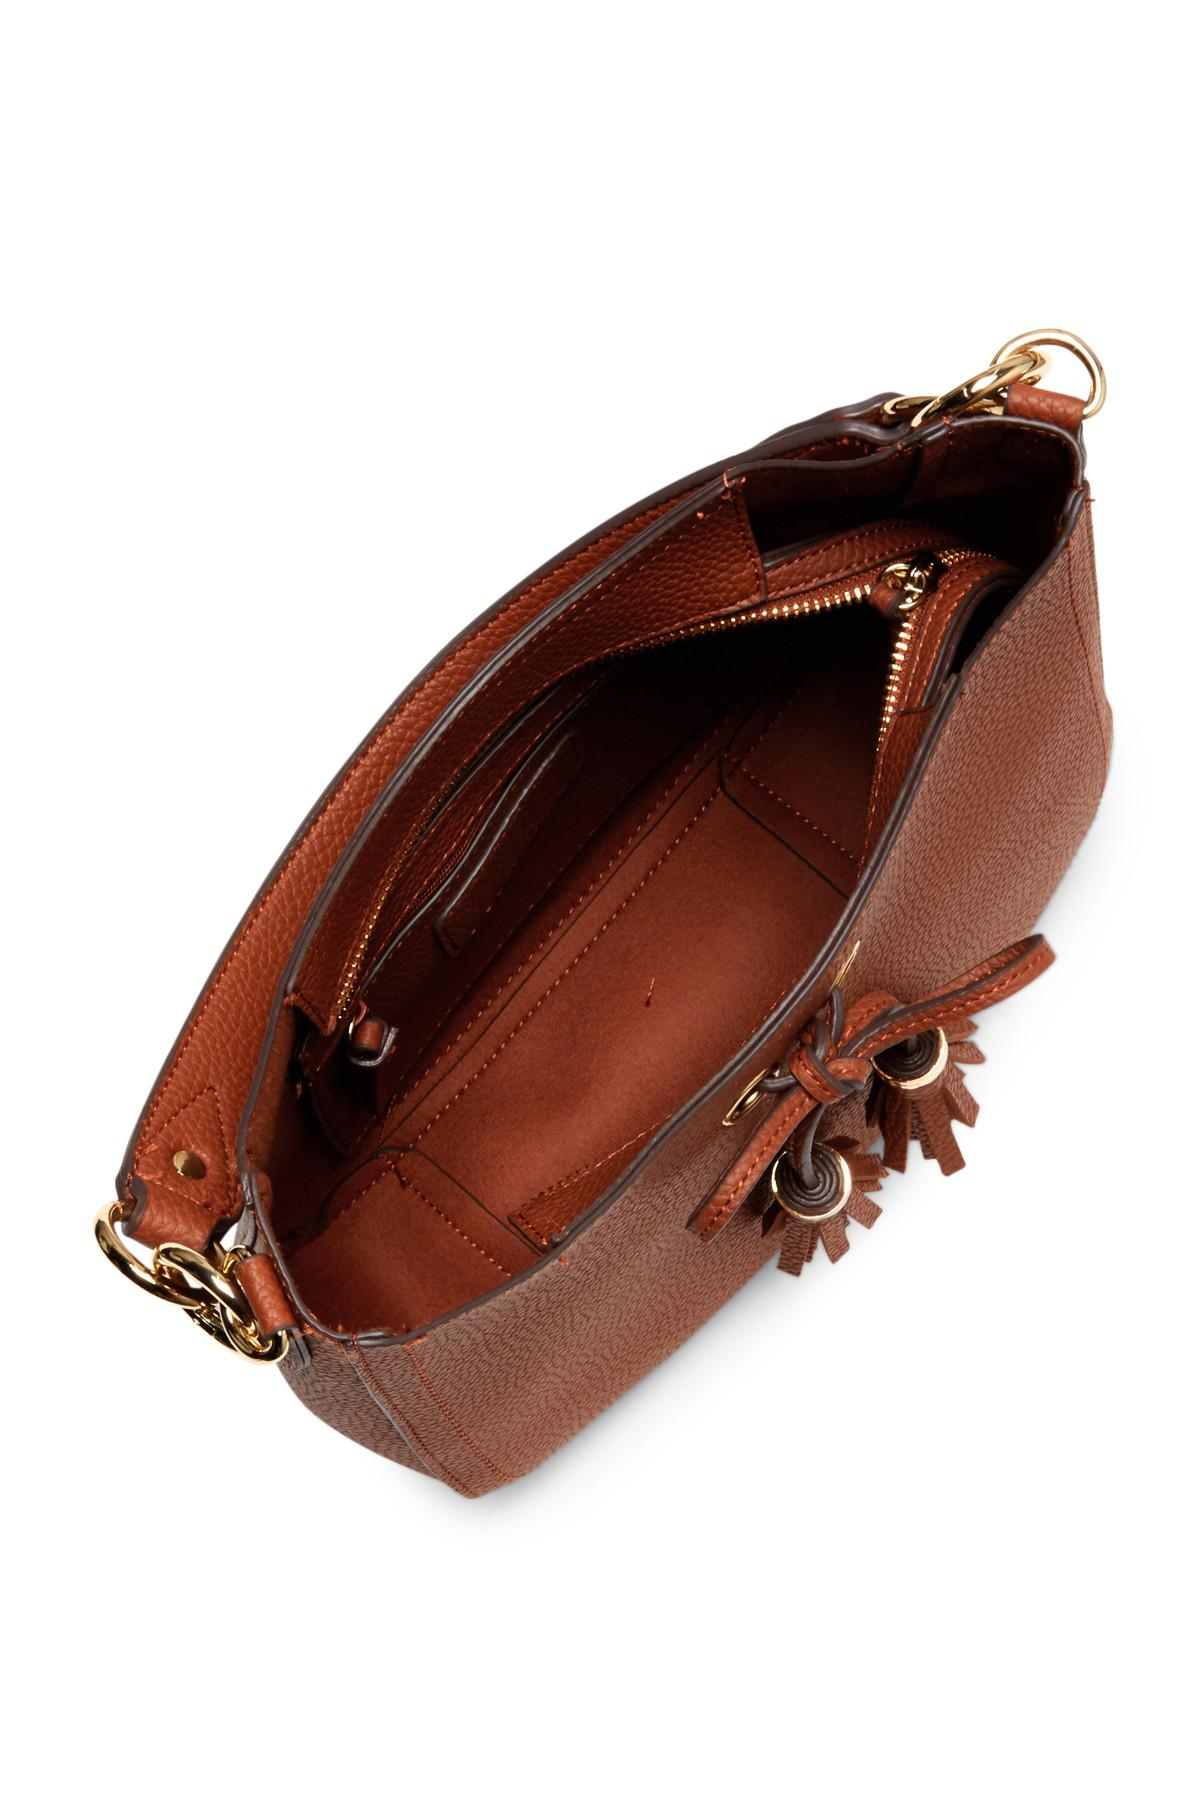 74185b9b3e6a Lyst - Jessica Simpson Elenore Crossbody Hobo Bag in Brown